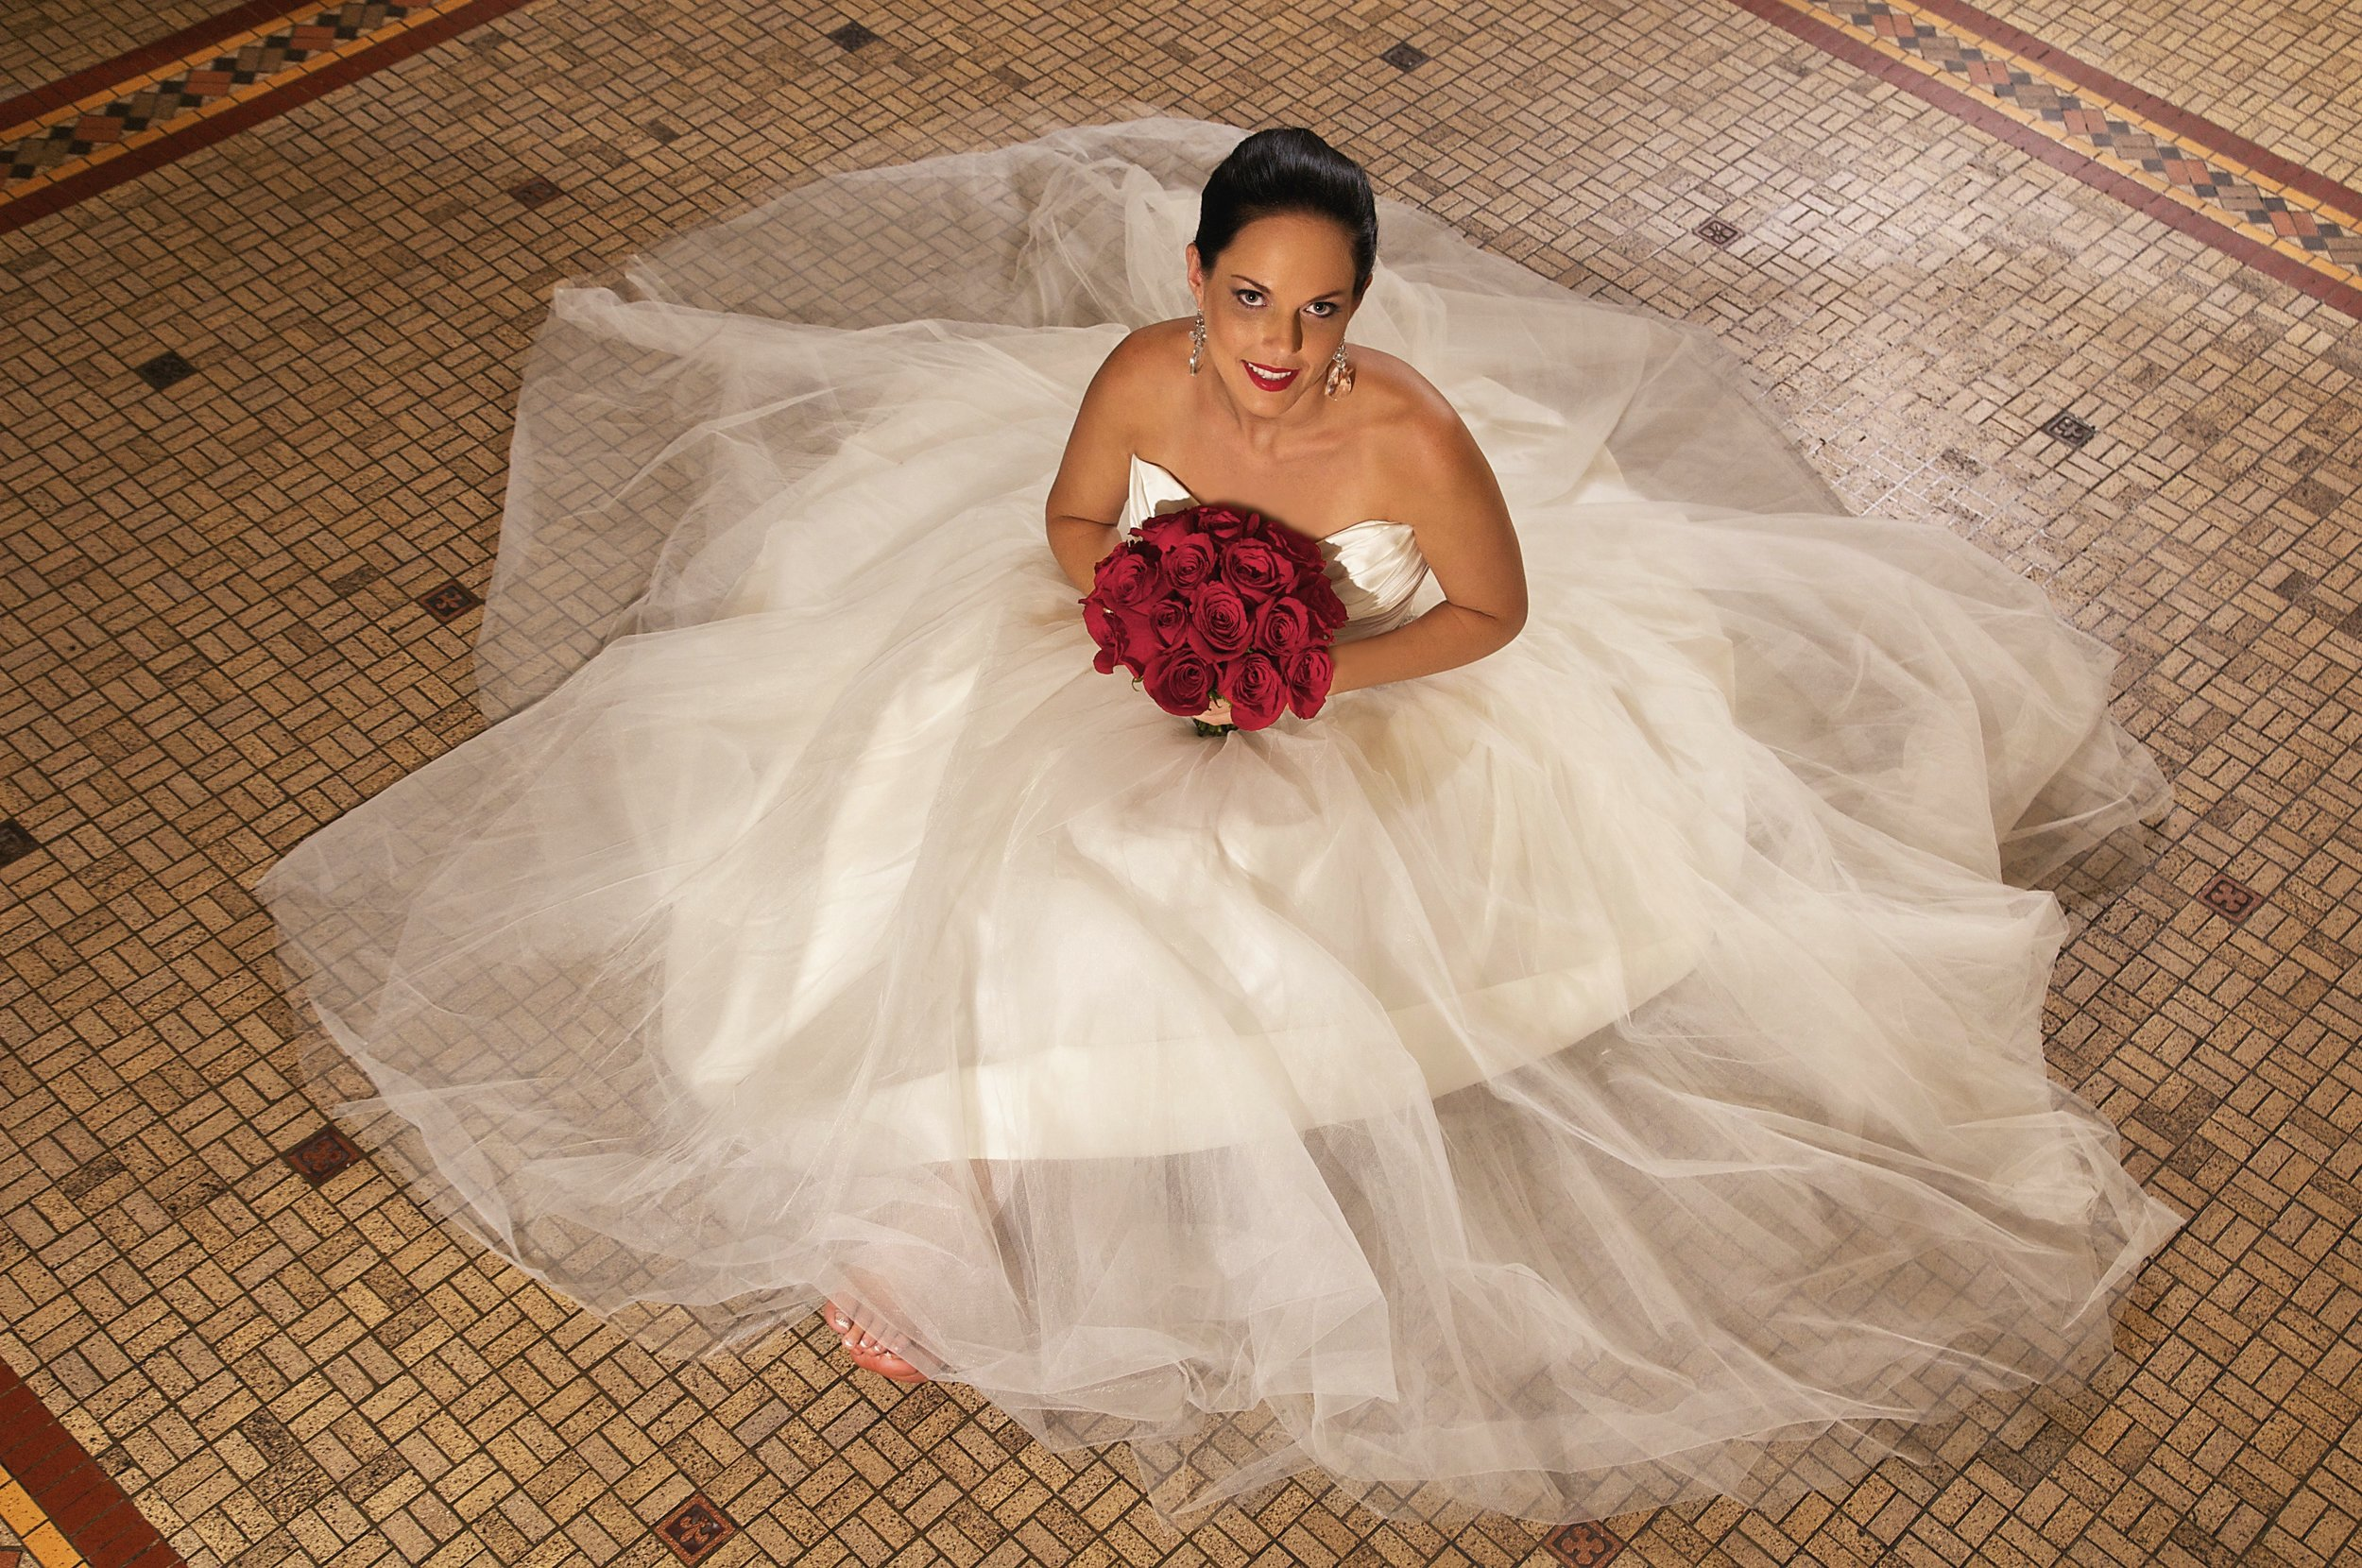 commercial-wedding-8-09-2011-courtyard-marriott-29520.jpg